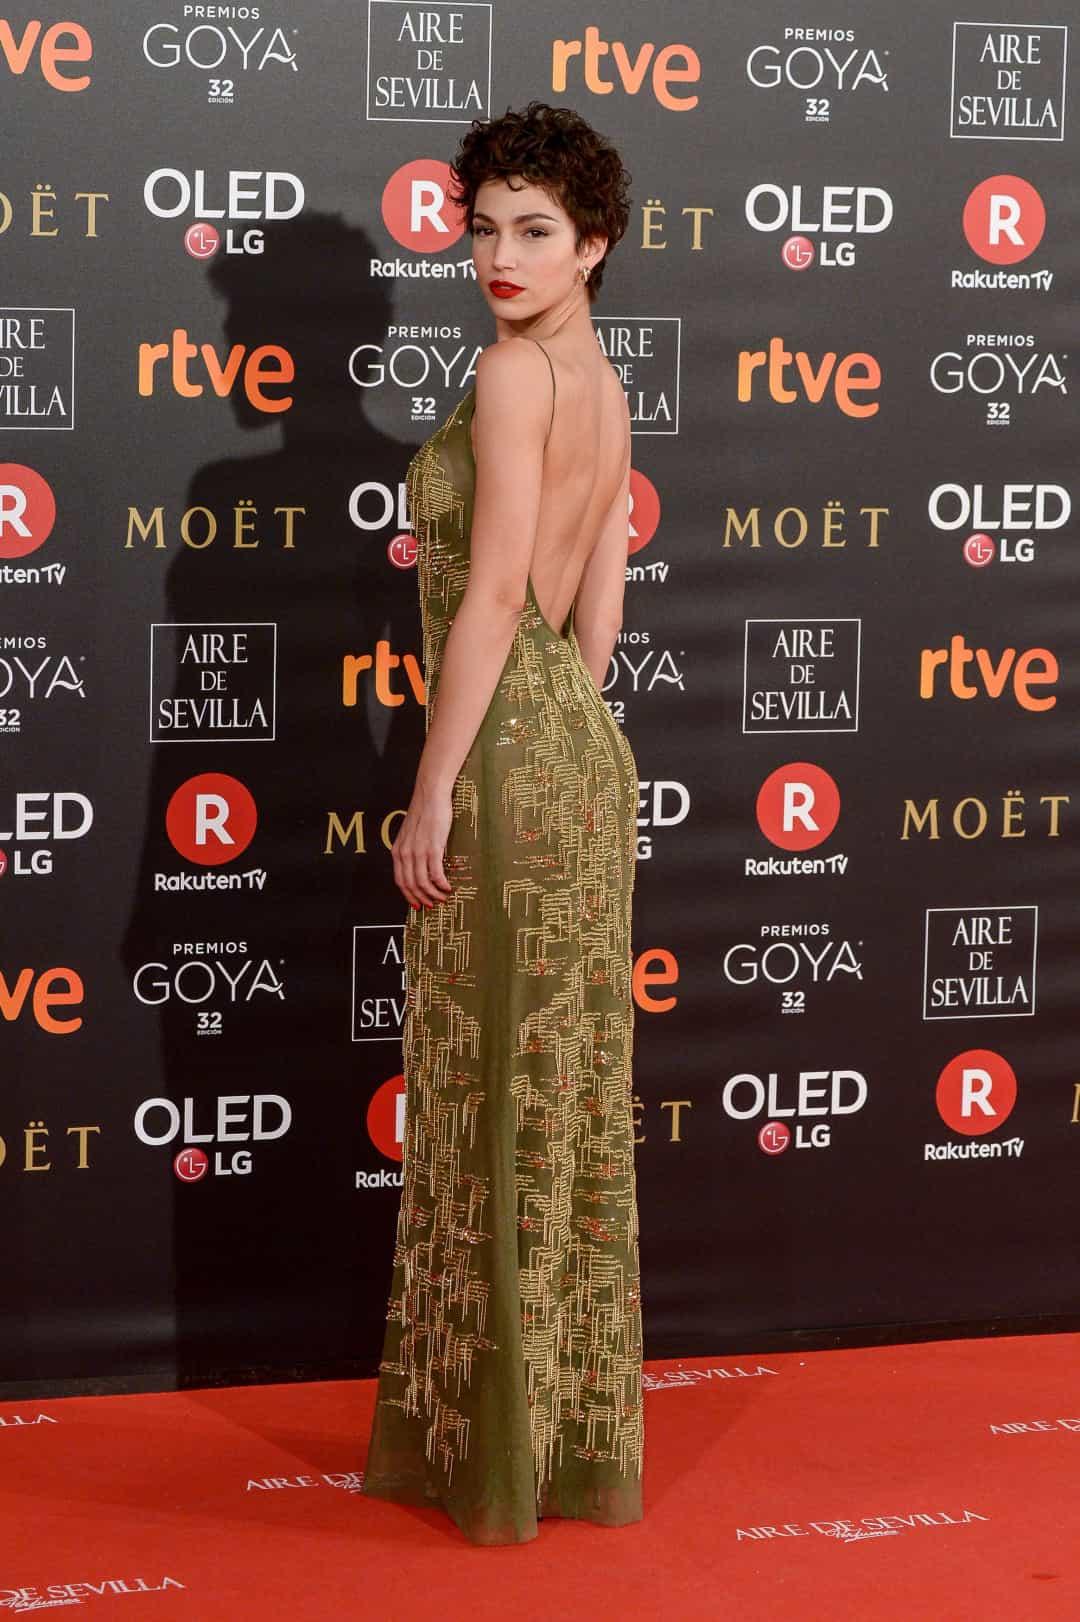 Ursula Corbero Money Heist tham dự Goya Cinema Awards 2018